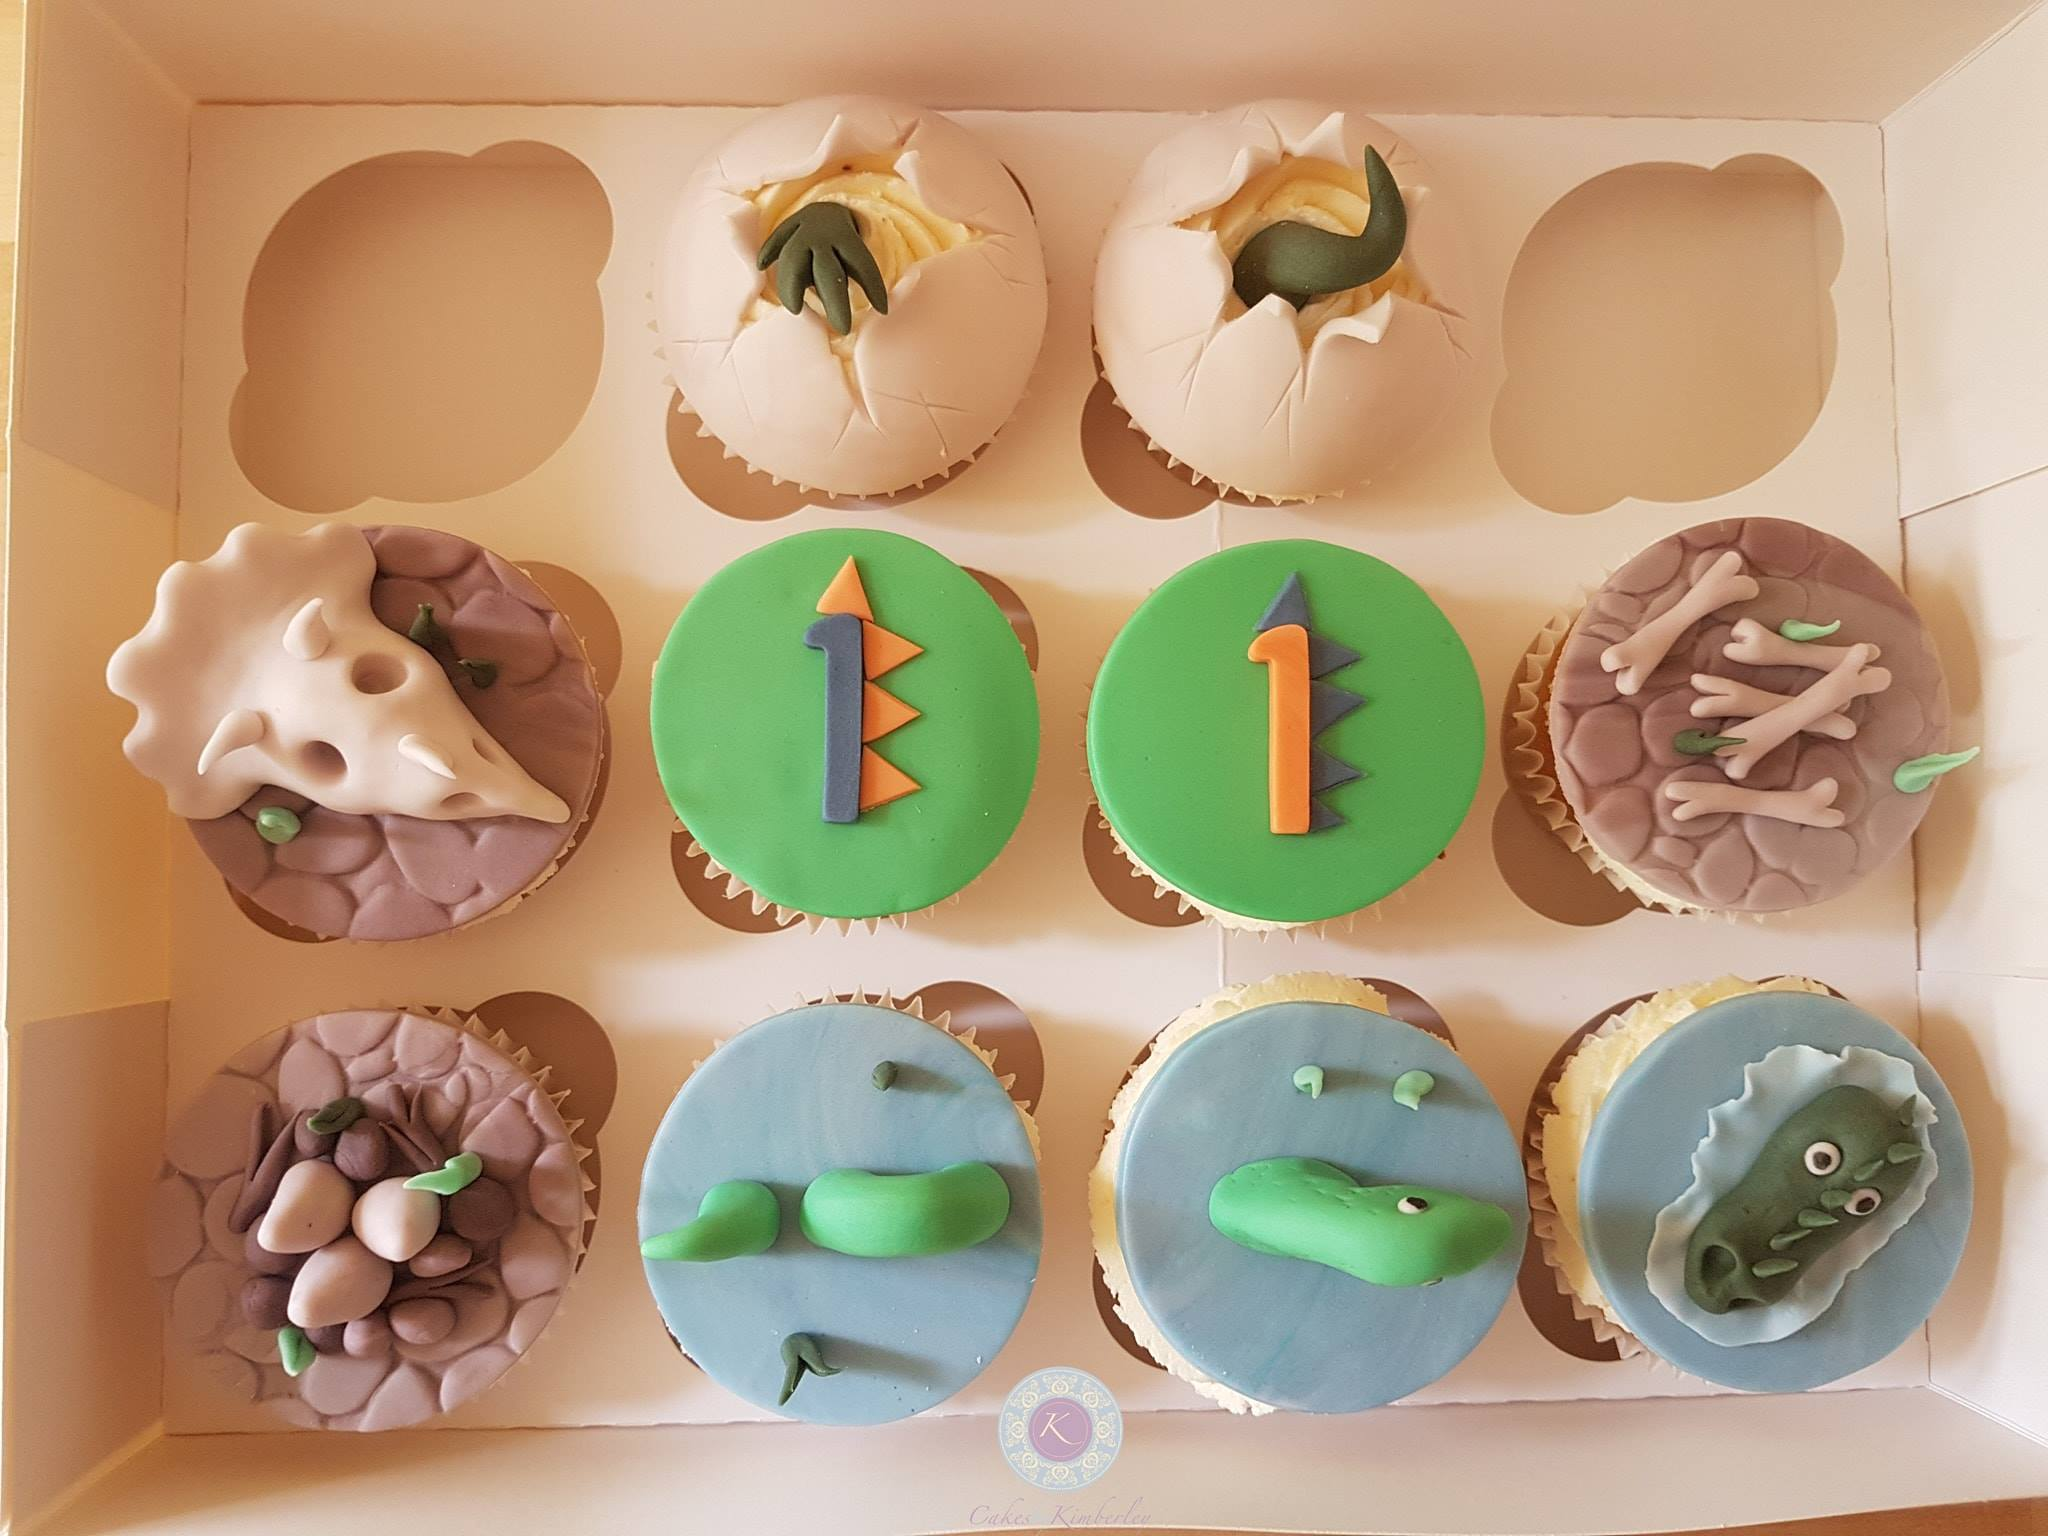 Cupcakes - Iwan